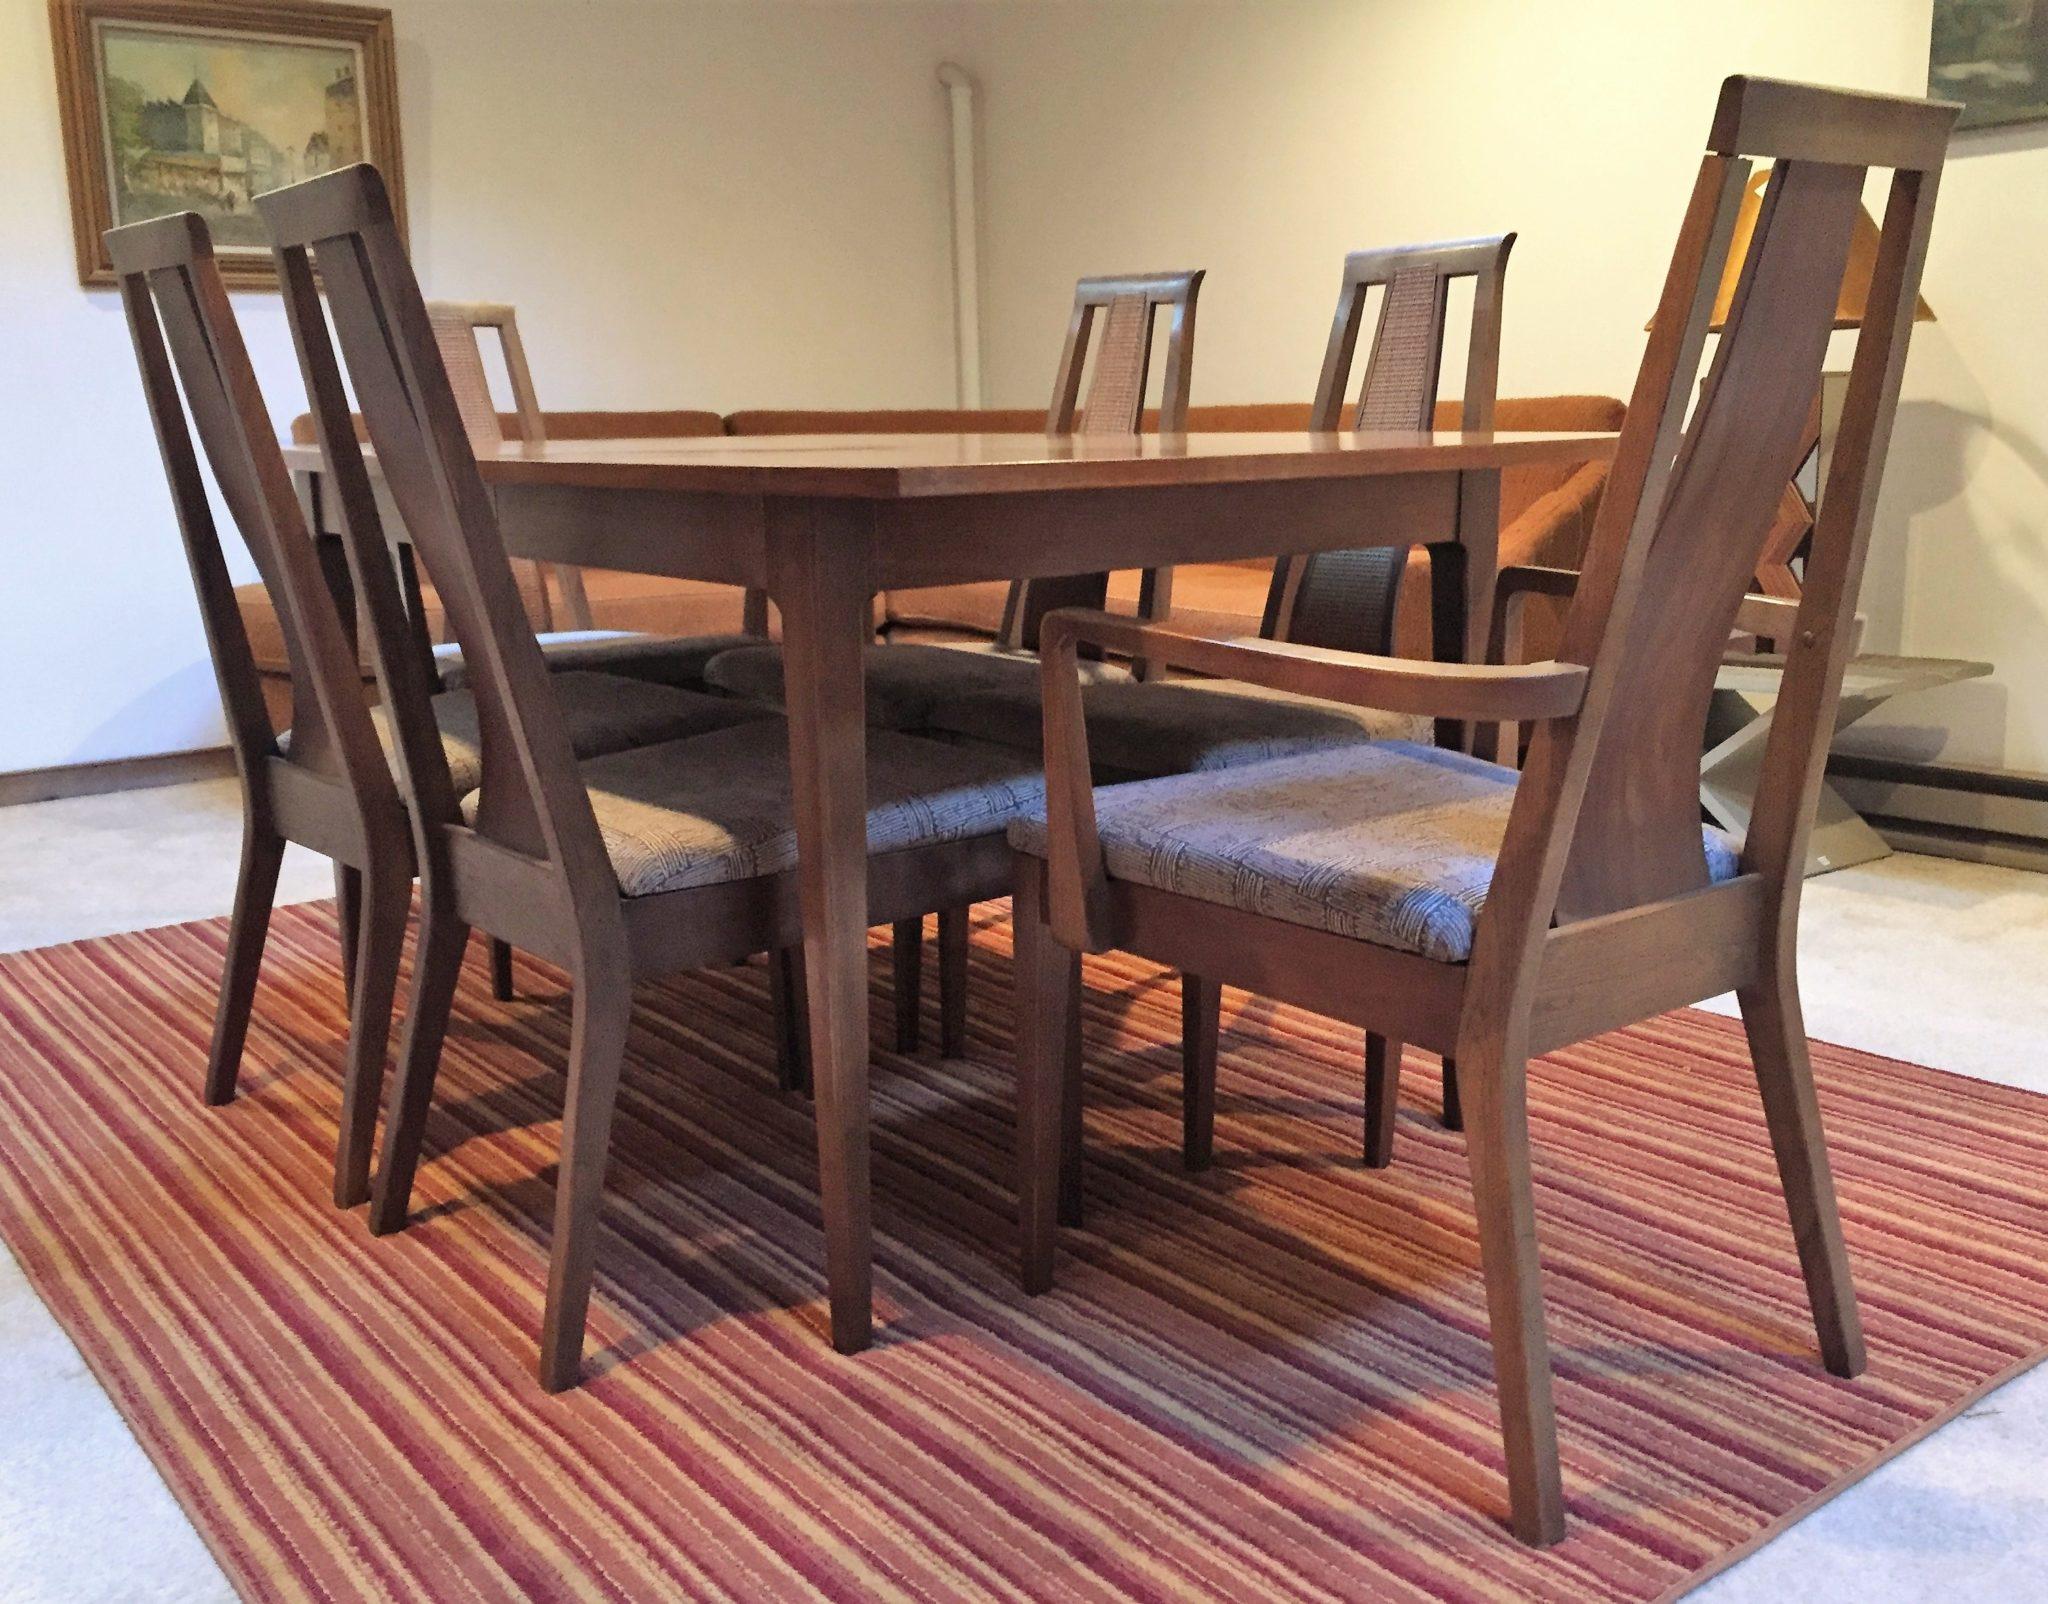 american of martinsville dining room set | Mid Mod Walnut Dining Set by American of Martinsville - EPOCH